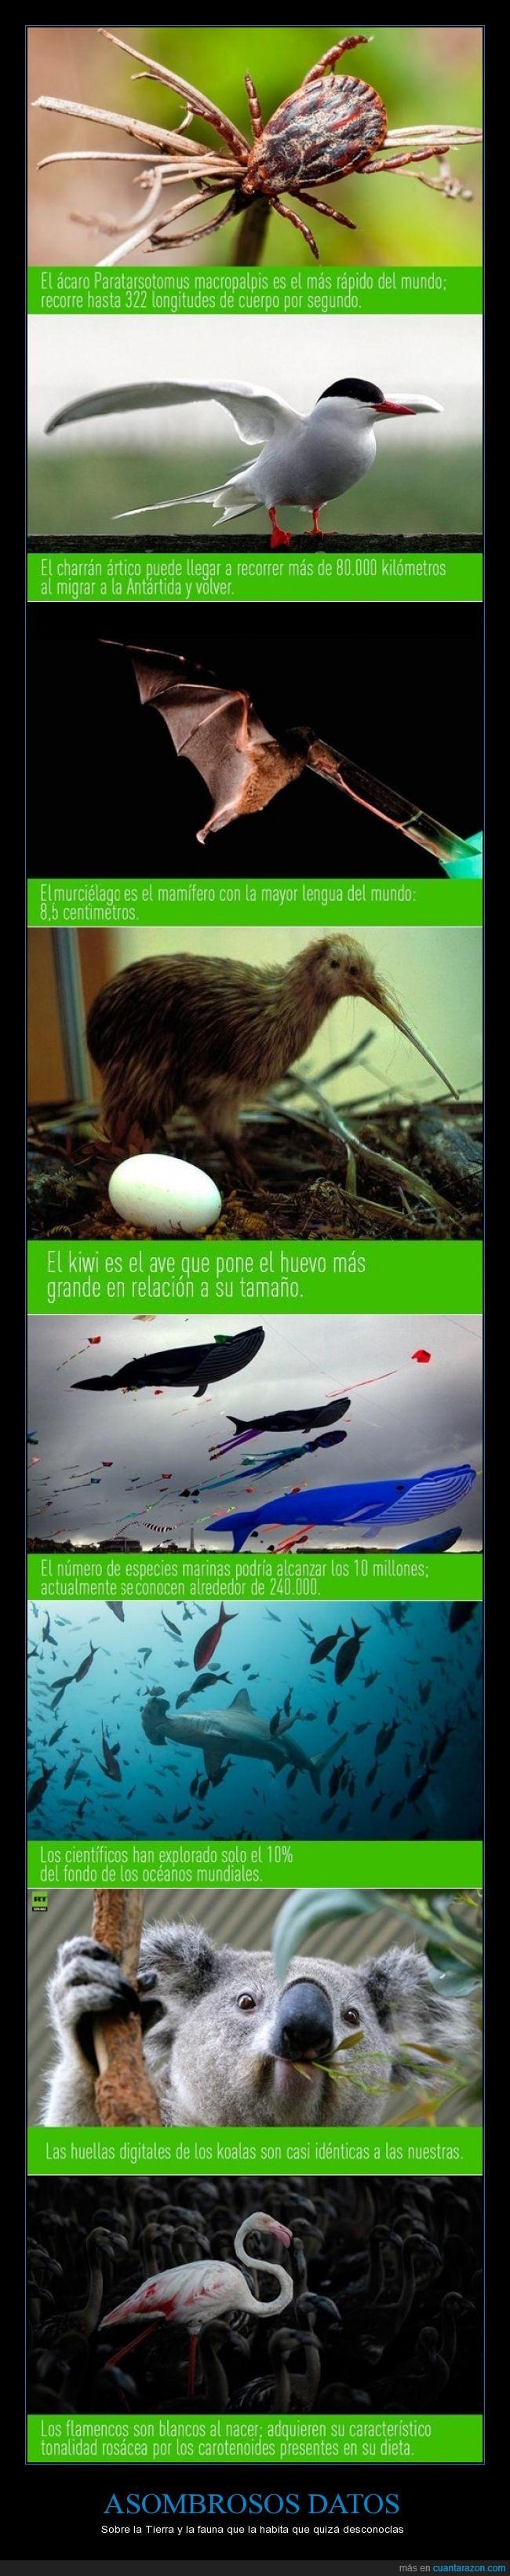 ácaro Paratarsotomus macropalpis,asombrosos datos,Charrán ártico,especies marinas,fauna,flamencos rosas,interesantes,kiwi,koalas,murciélago,naturaleza,Tierra